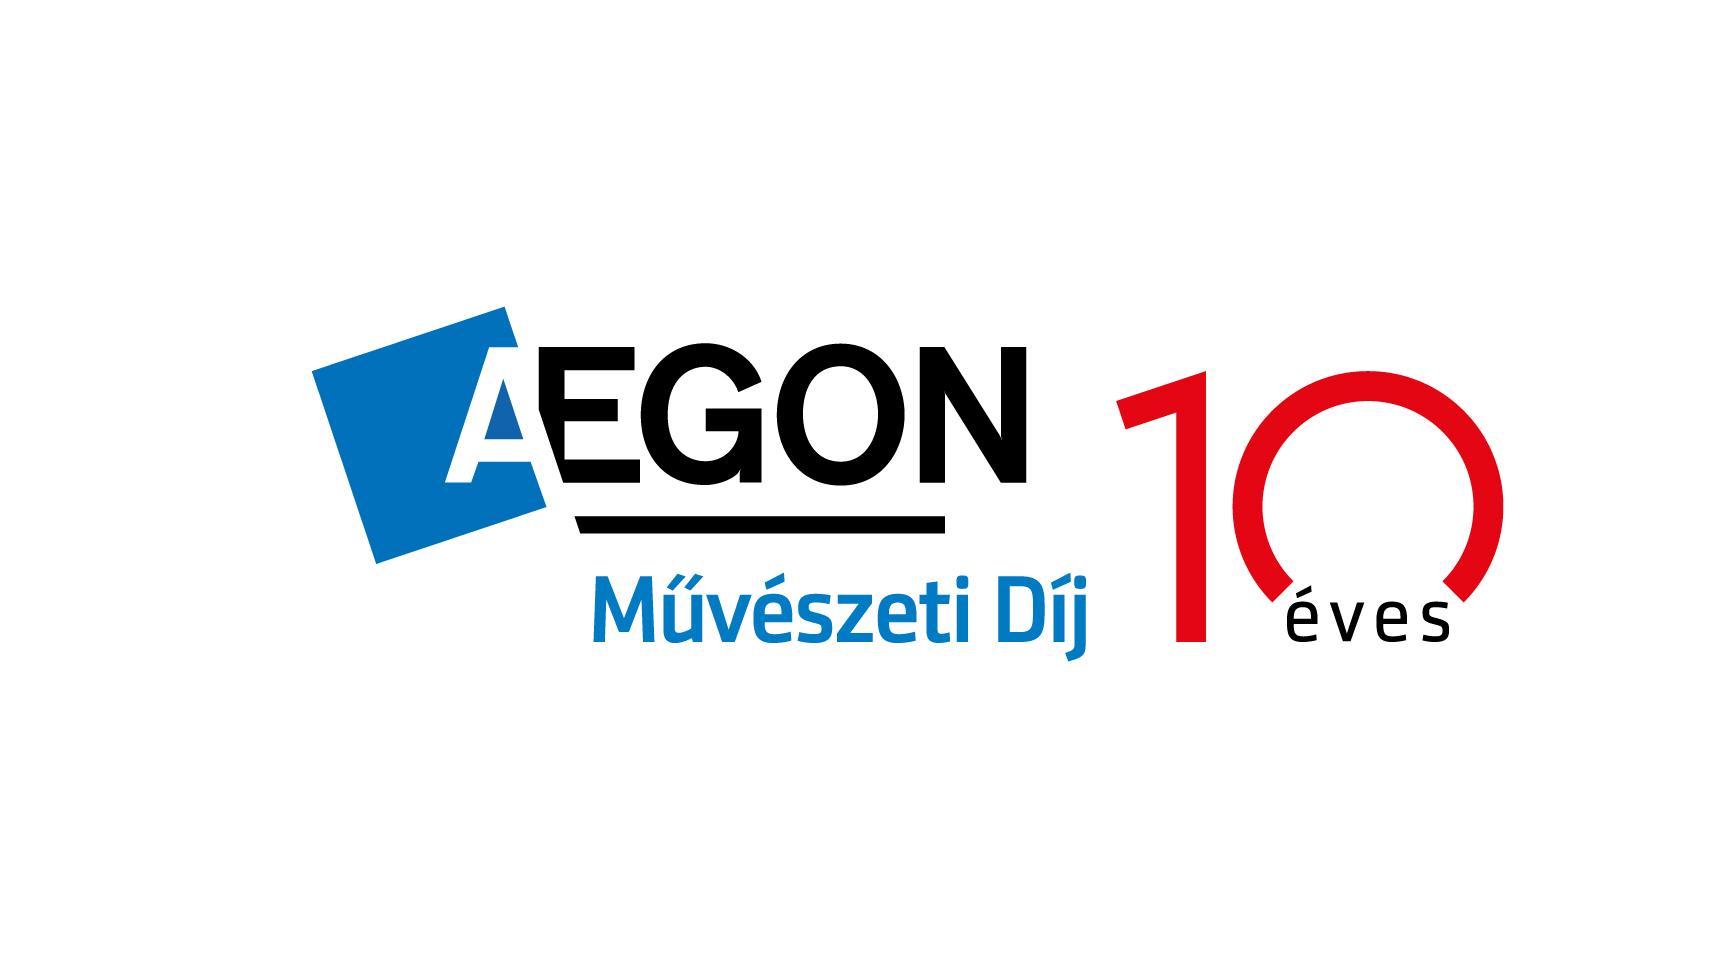 aegon_dij_jubileumi_logo-01.jpg